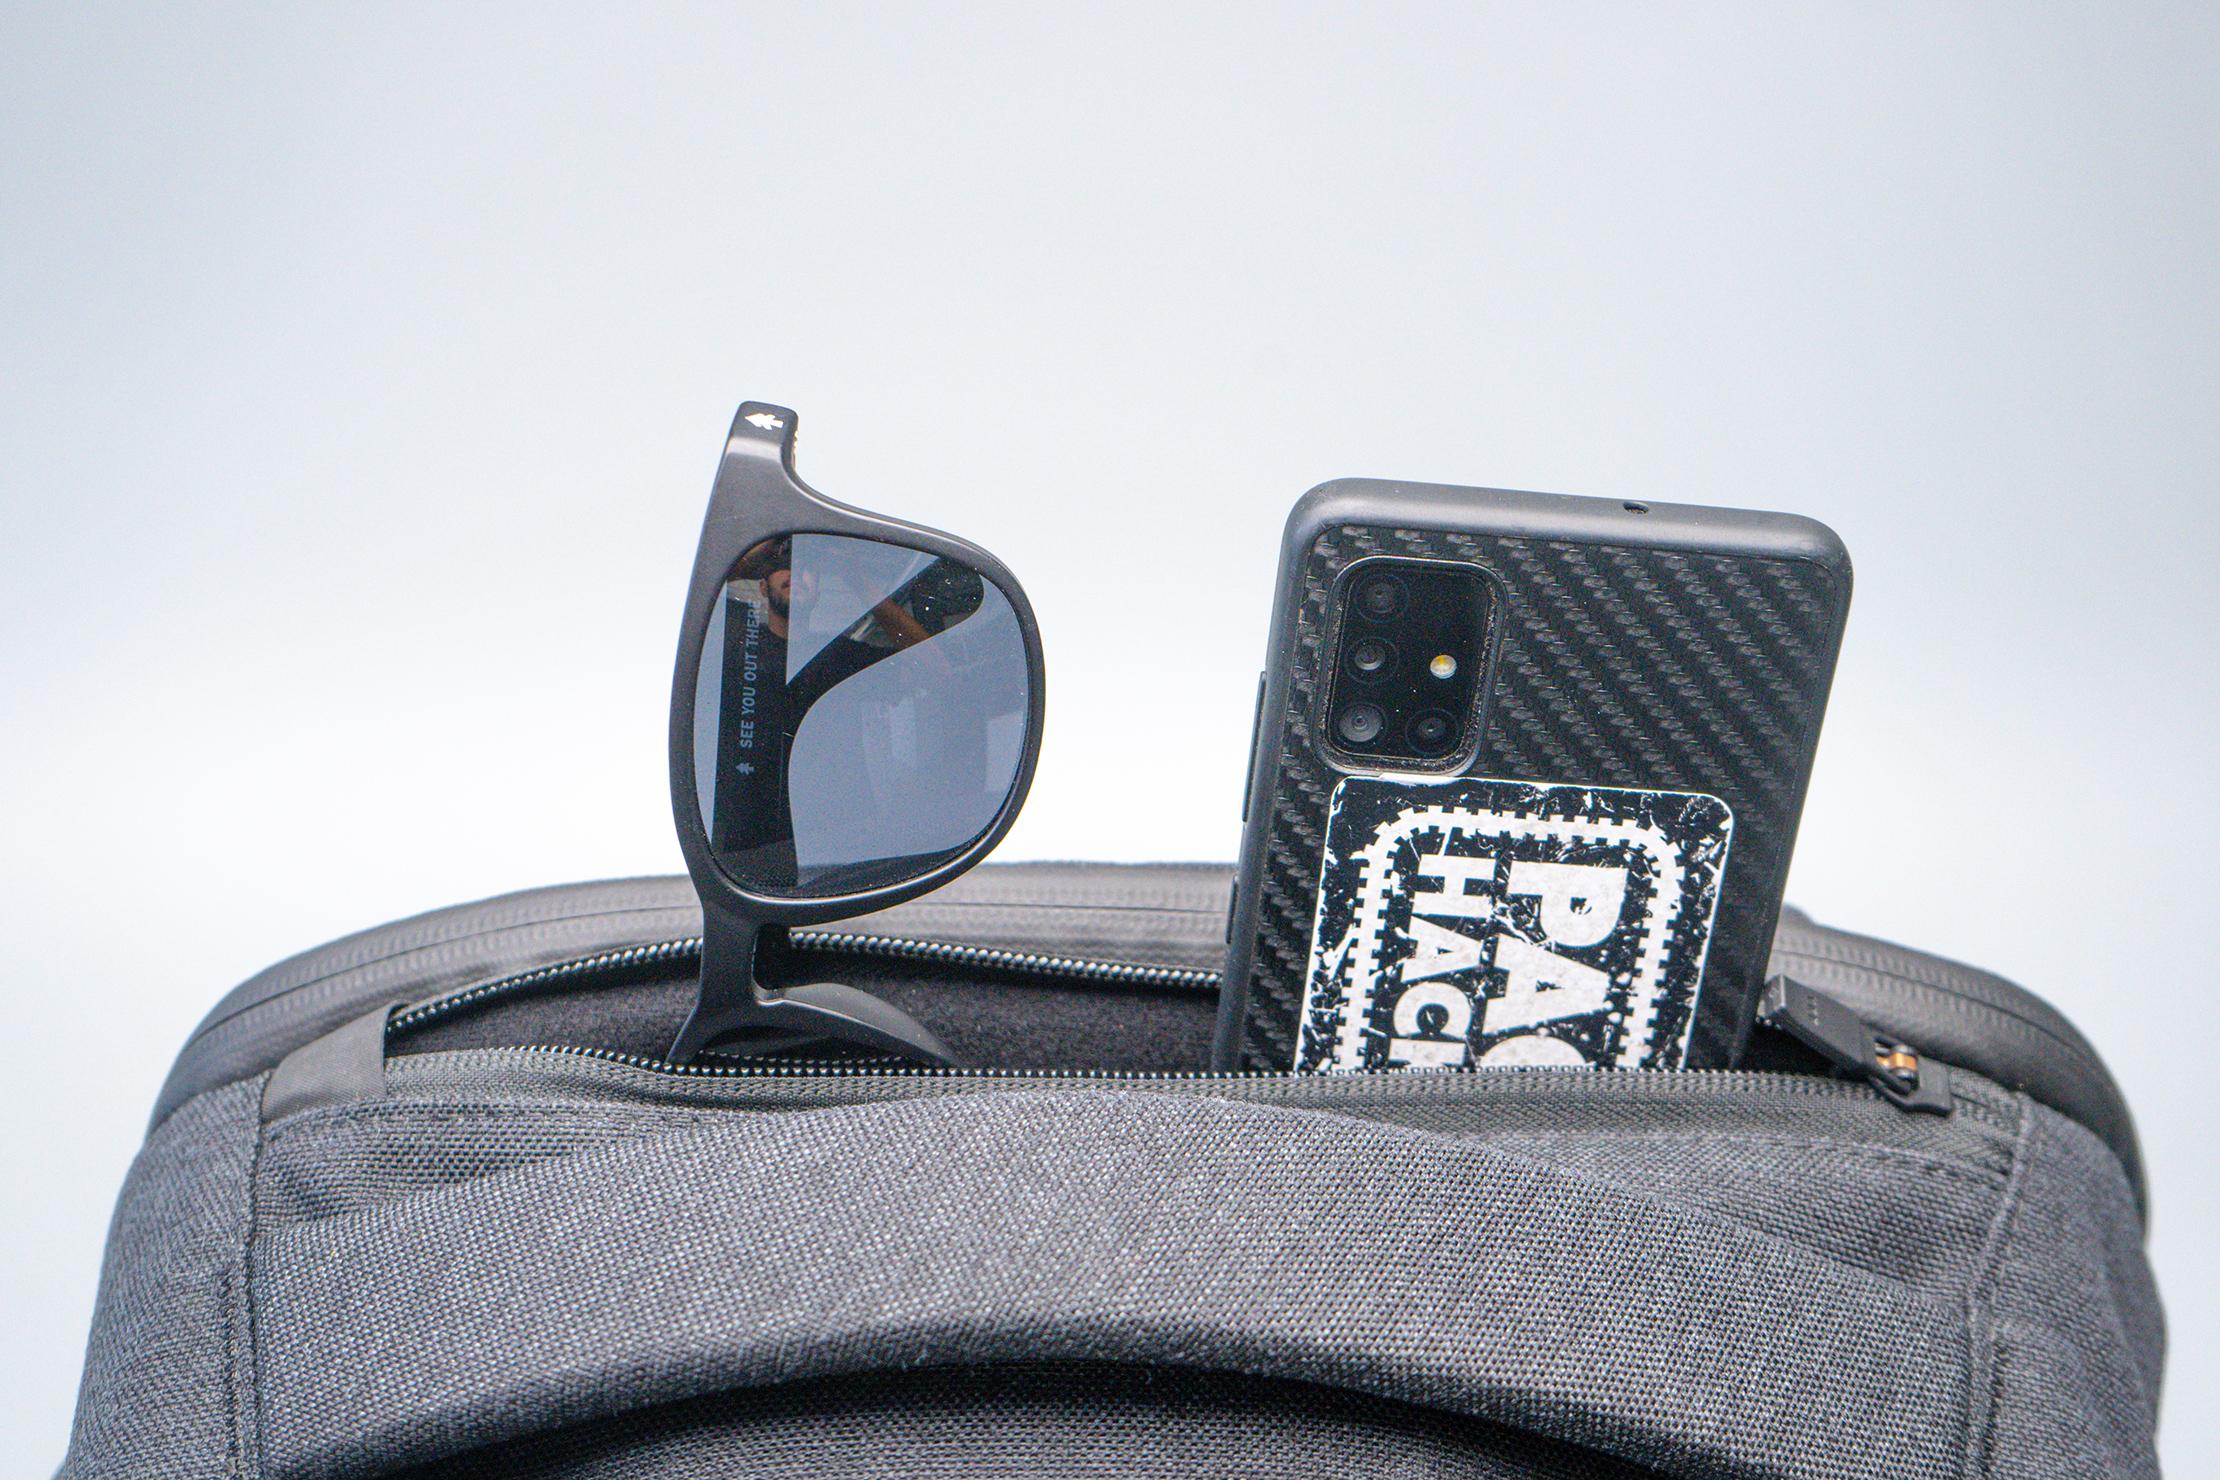 Aer x Ministry of Supply Lunar Pack Quick Grab Pocket